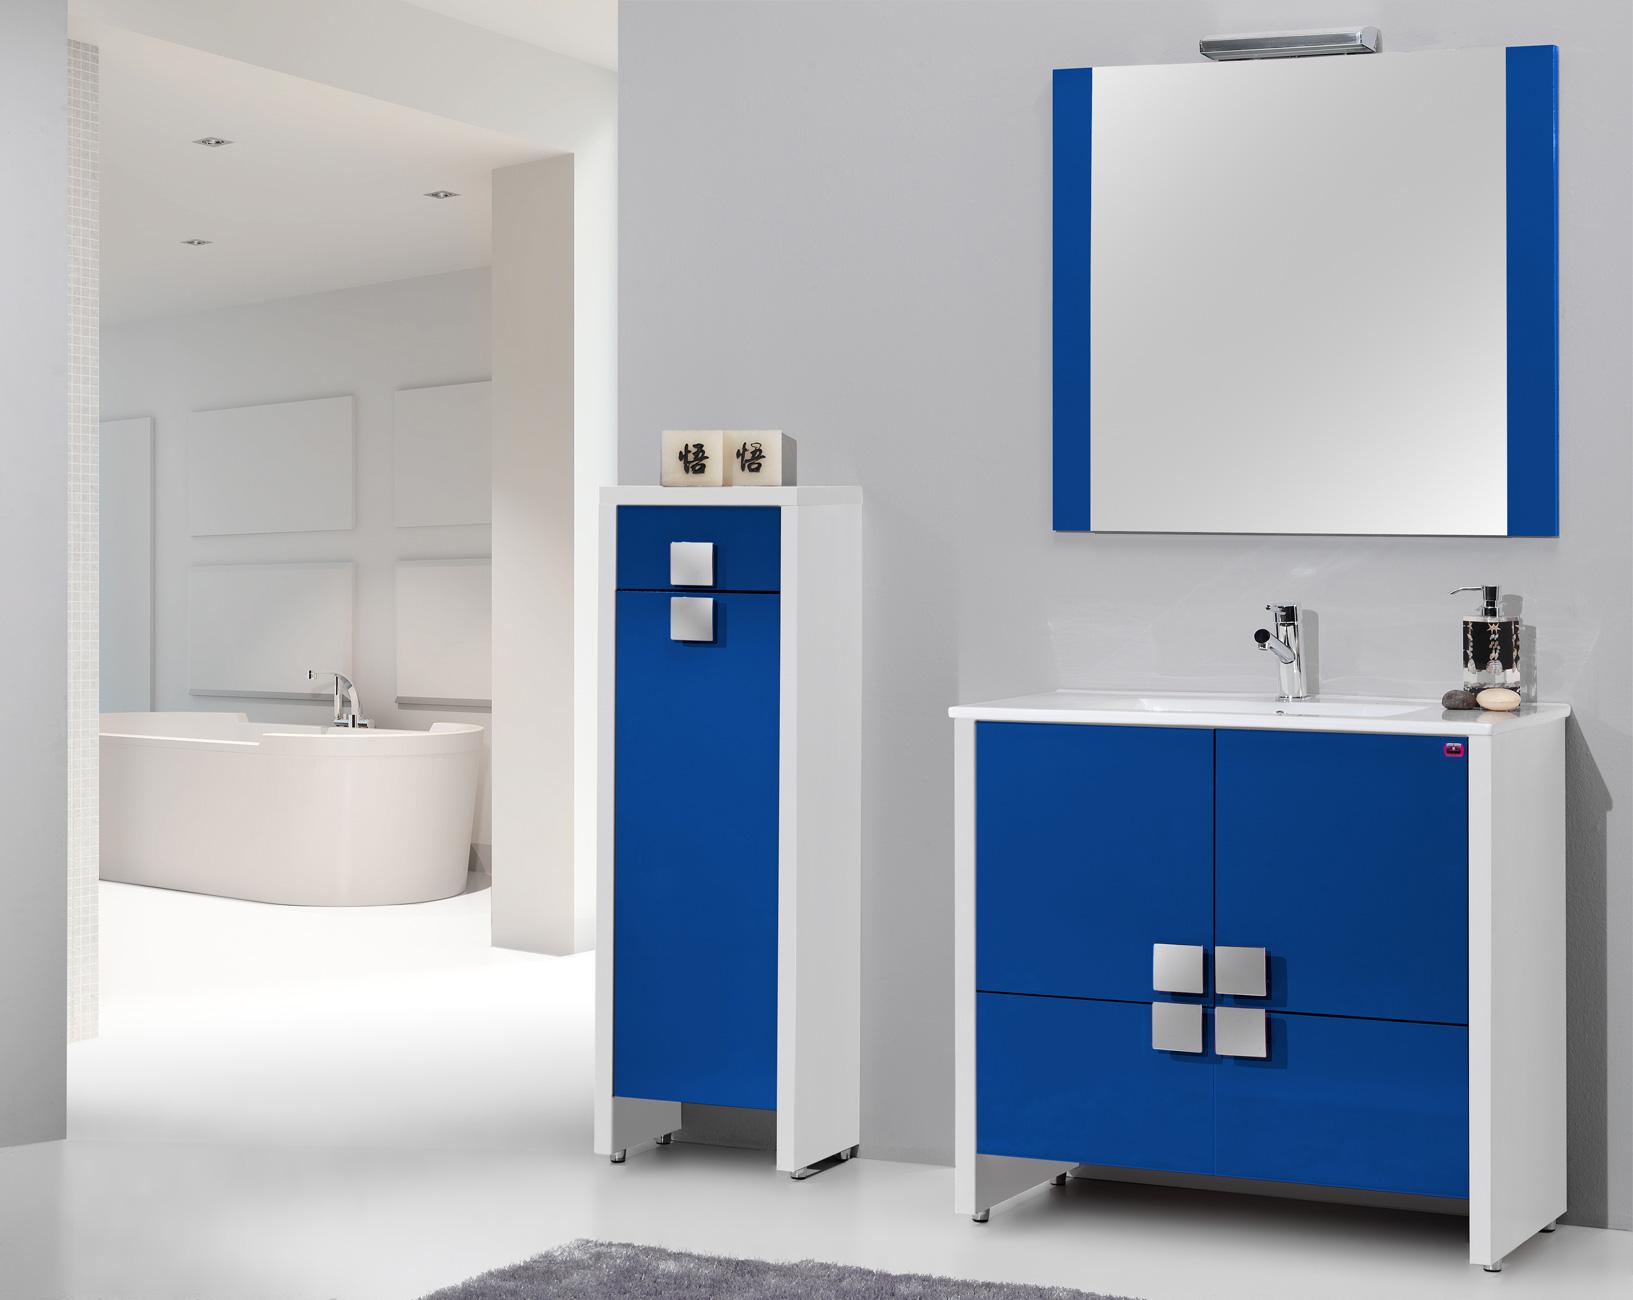 Muebles de bano azul dise os arquitect nicos for Decoracion mueble bano